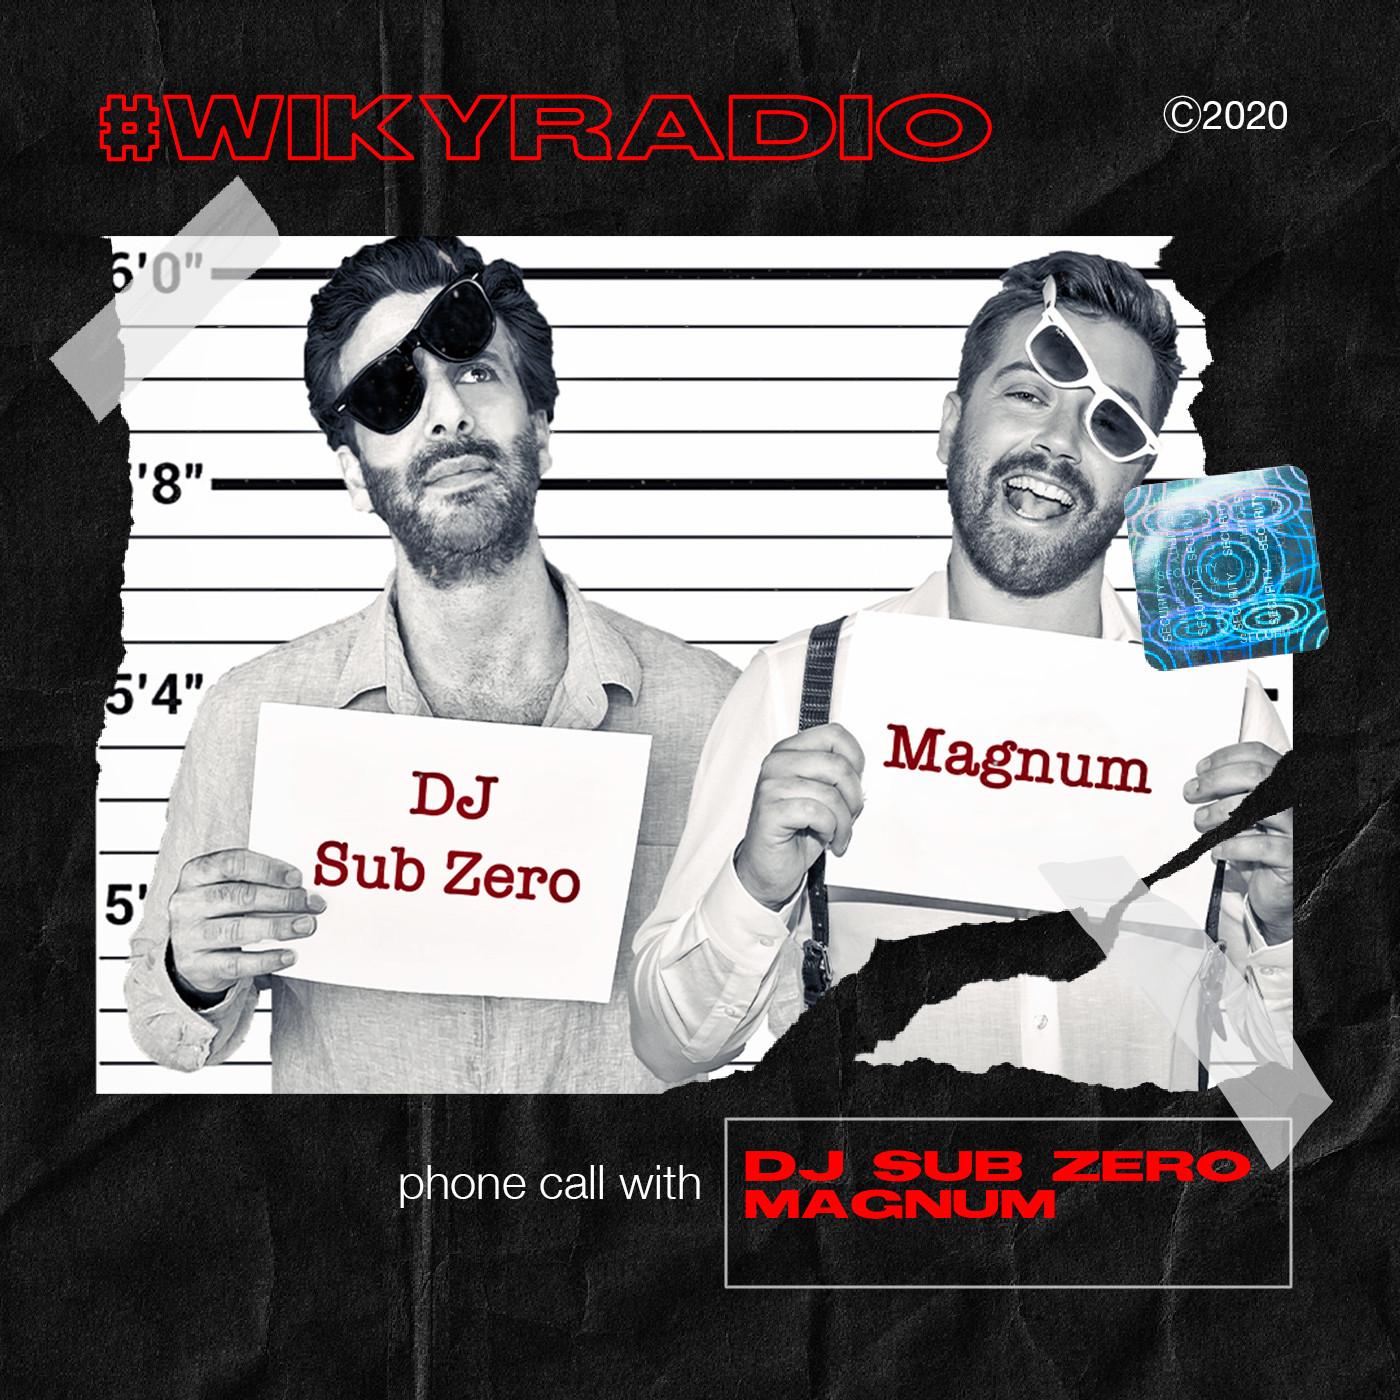 WIKY RADIO - PHONE CALL WITH DJ SUB ZERO & MAGNUM